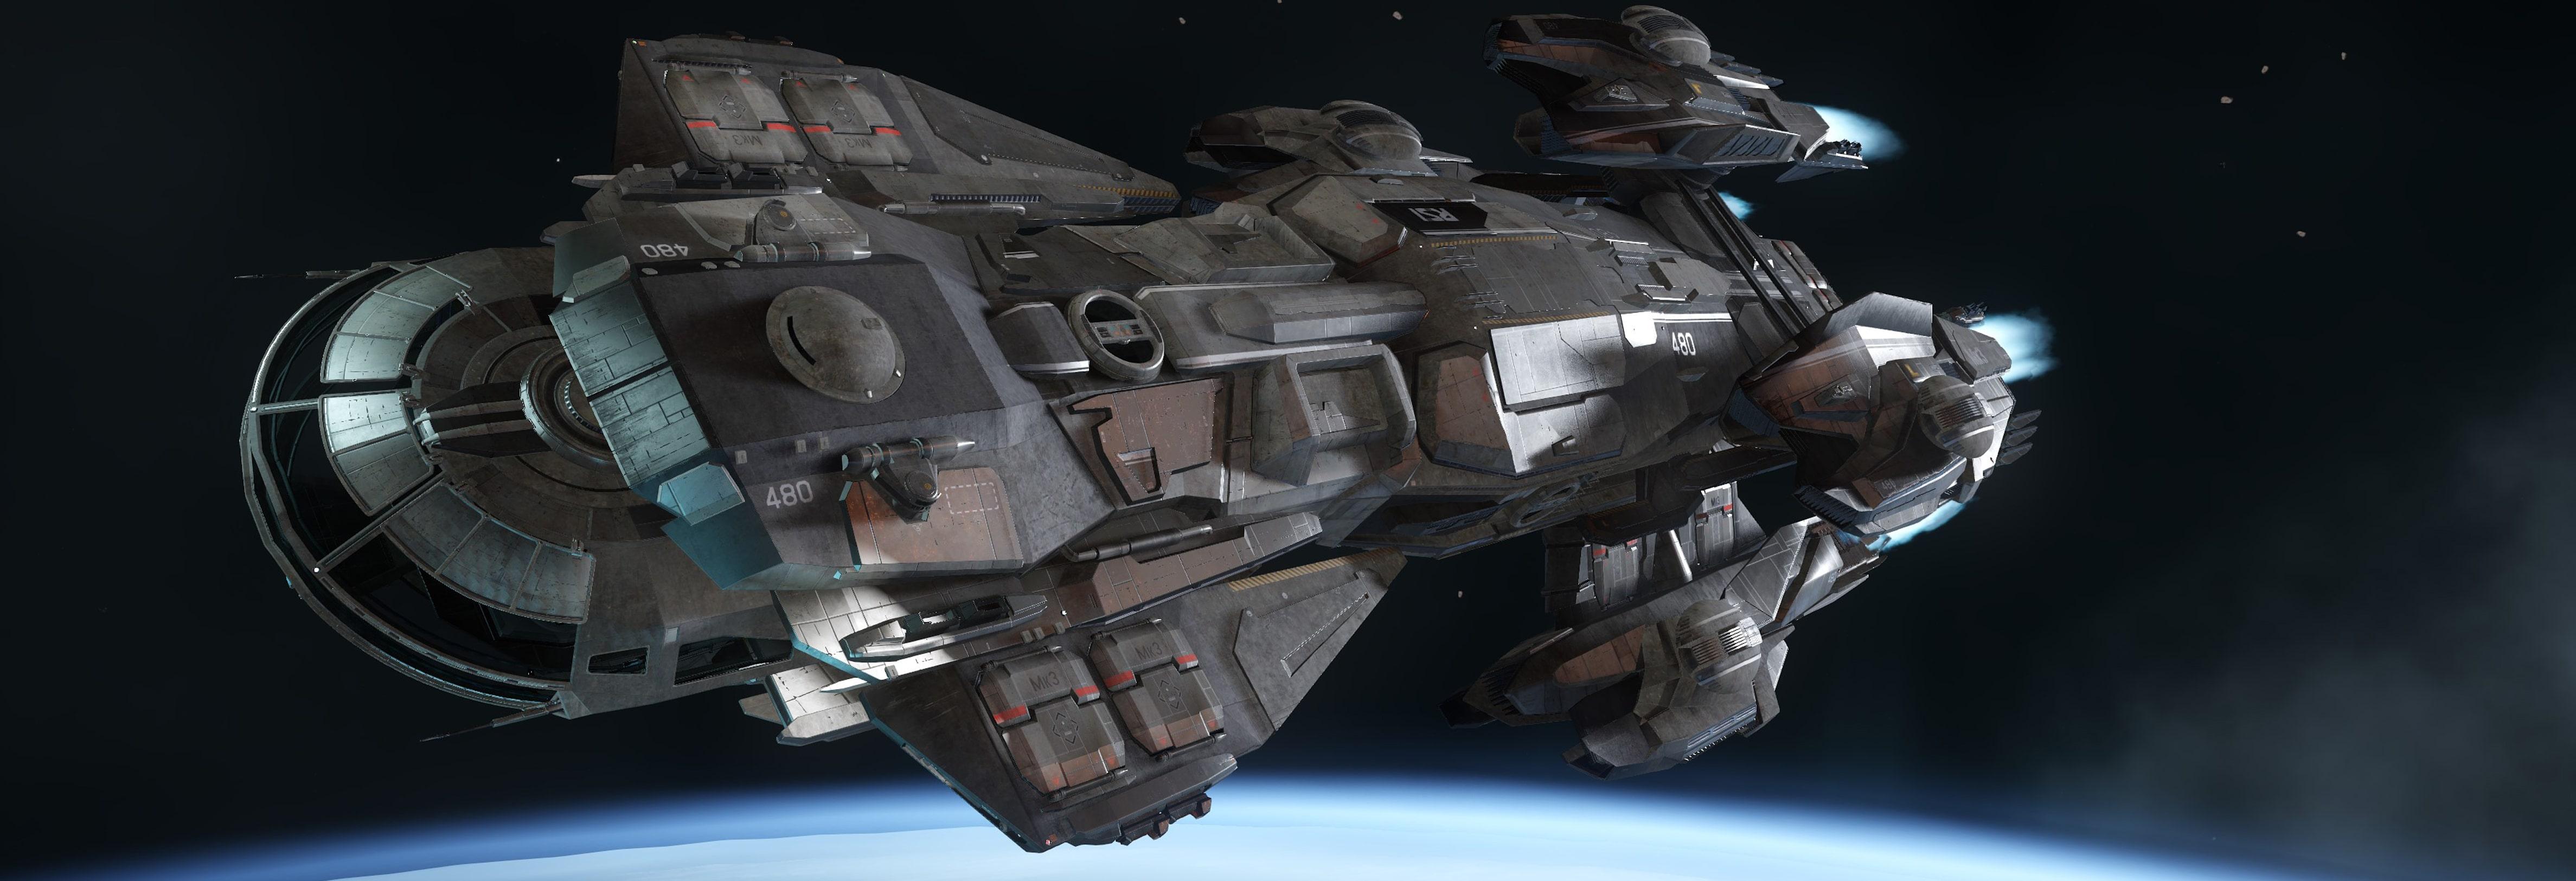 Aquila inflight min 1